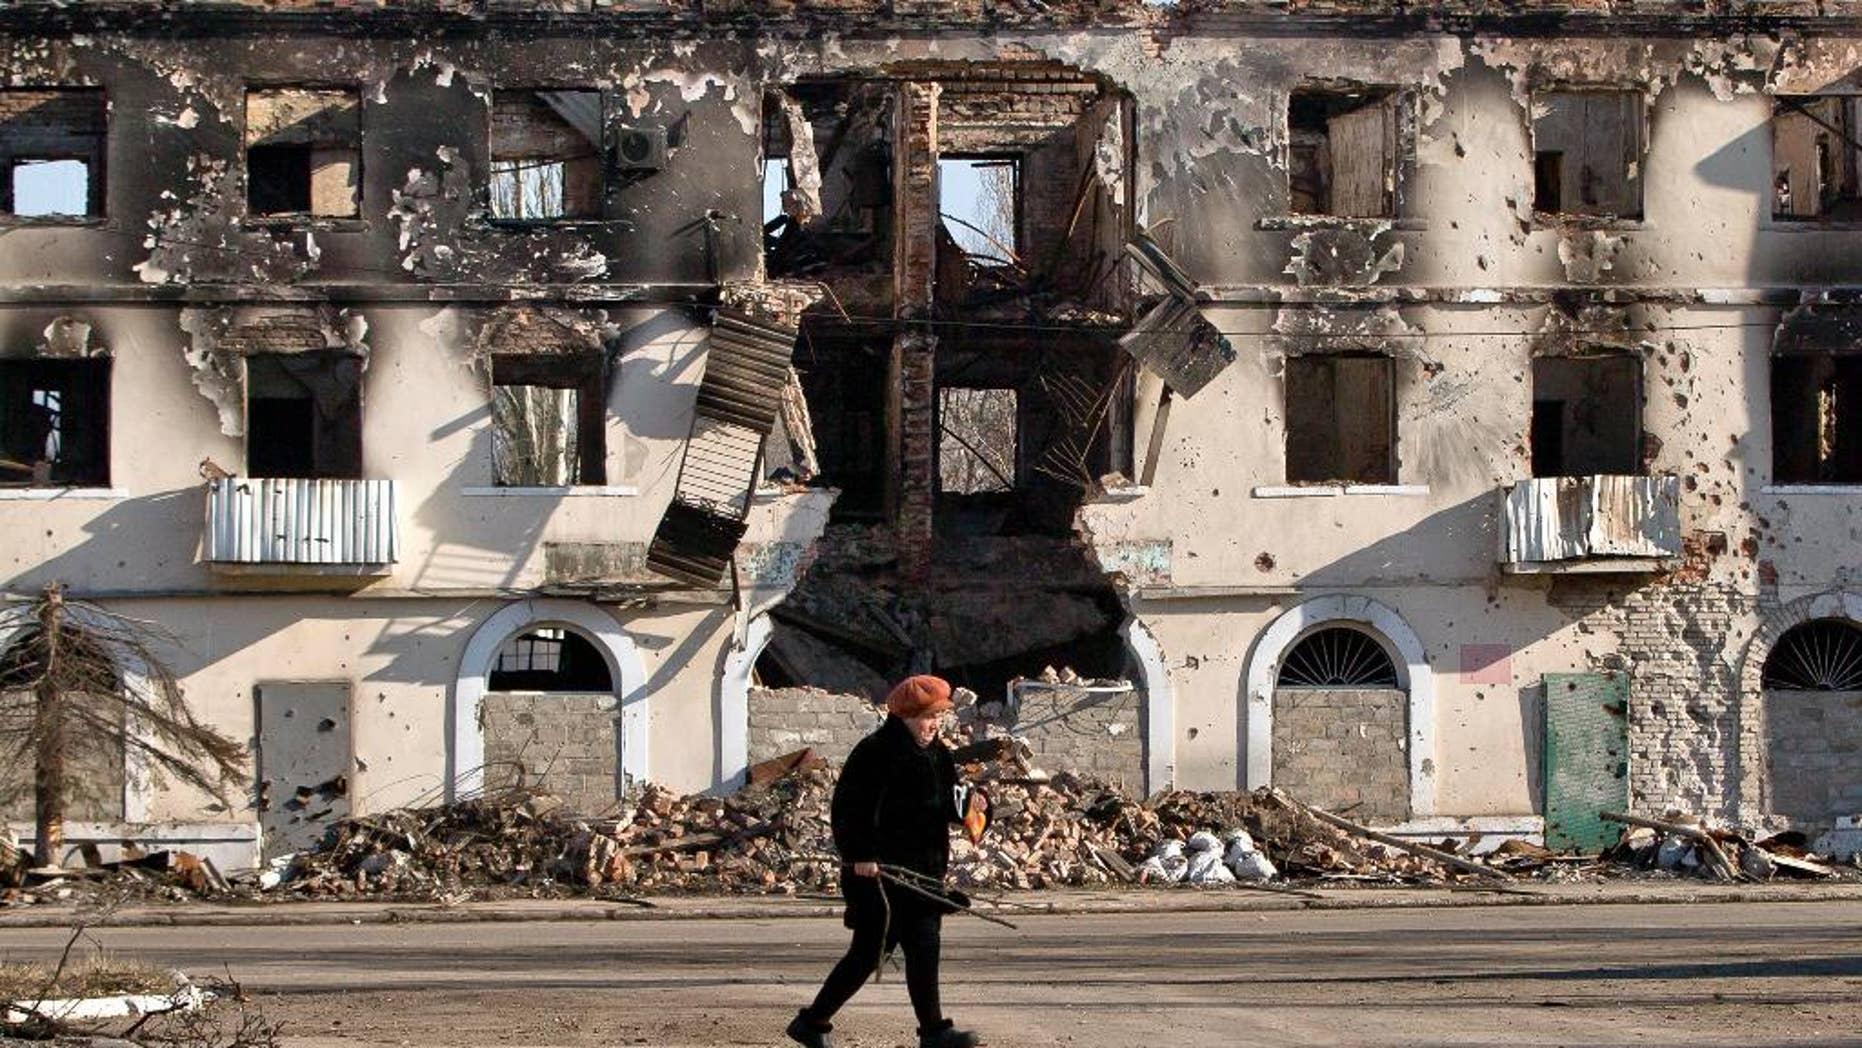 March 9, 2015: An elderly woman walks by a destroyed building in Vuhlehirsk, Ukraine.